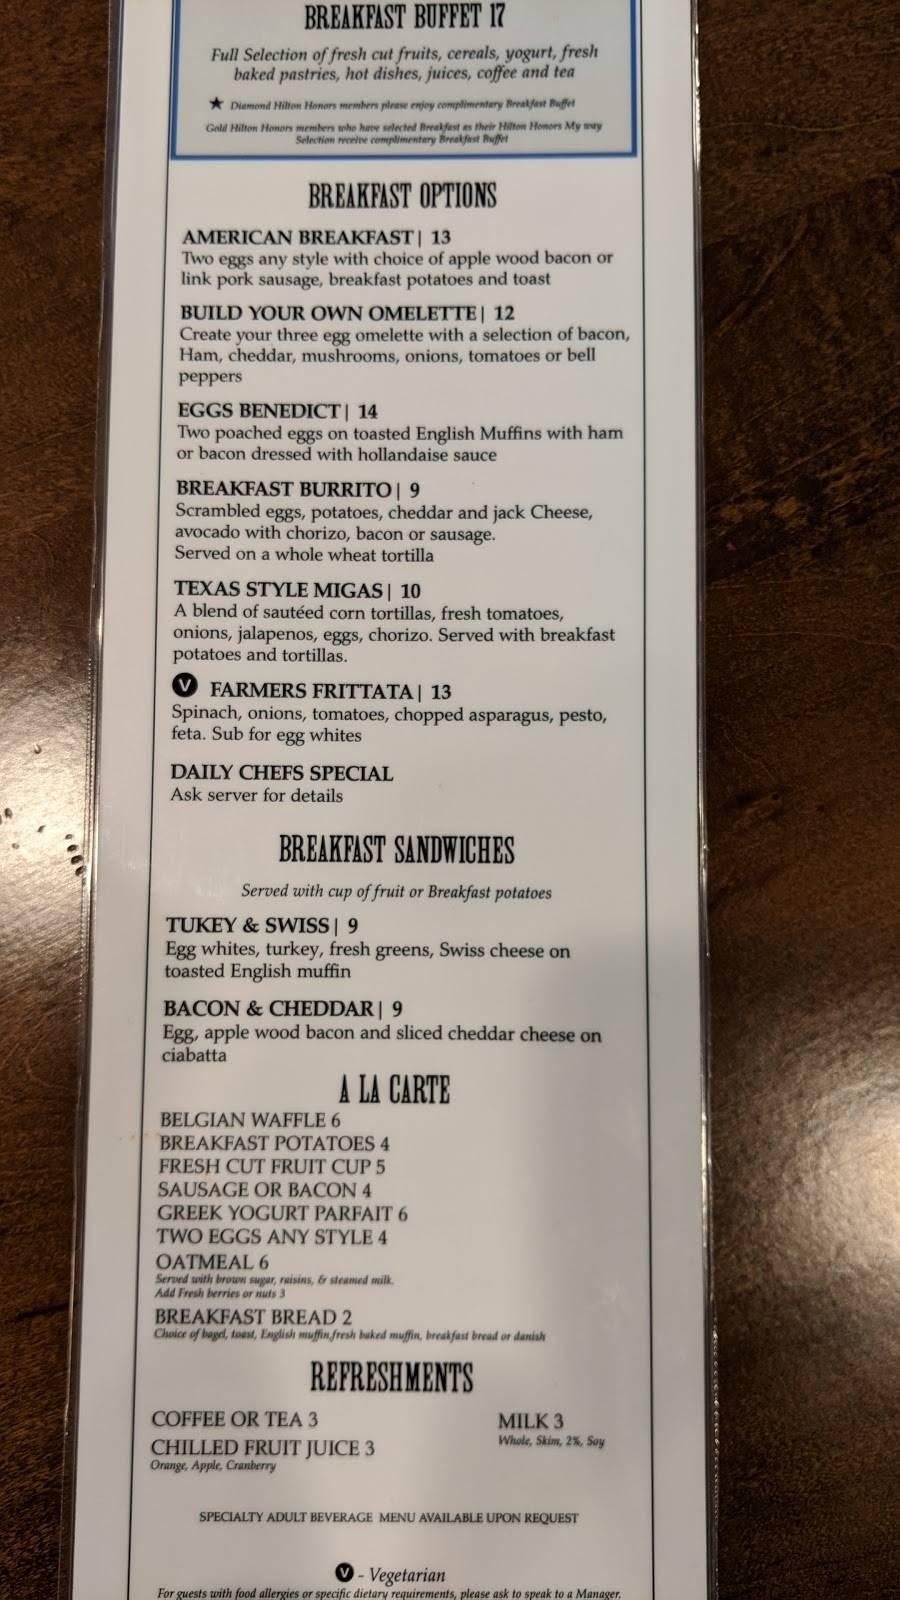 Club Cafe - restaurant    Photo 1 of 1   Address: 11611 Luna Rd, Farmers Branch, TX 75234, USA   Phone: (972) 506-0055